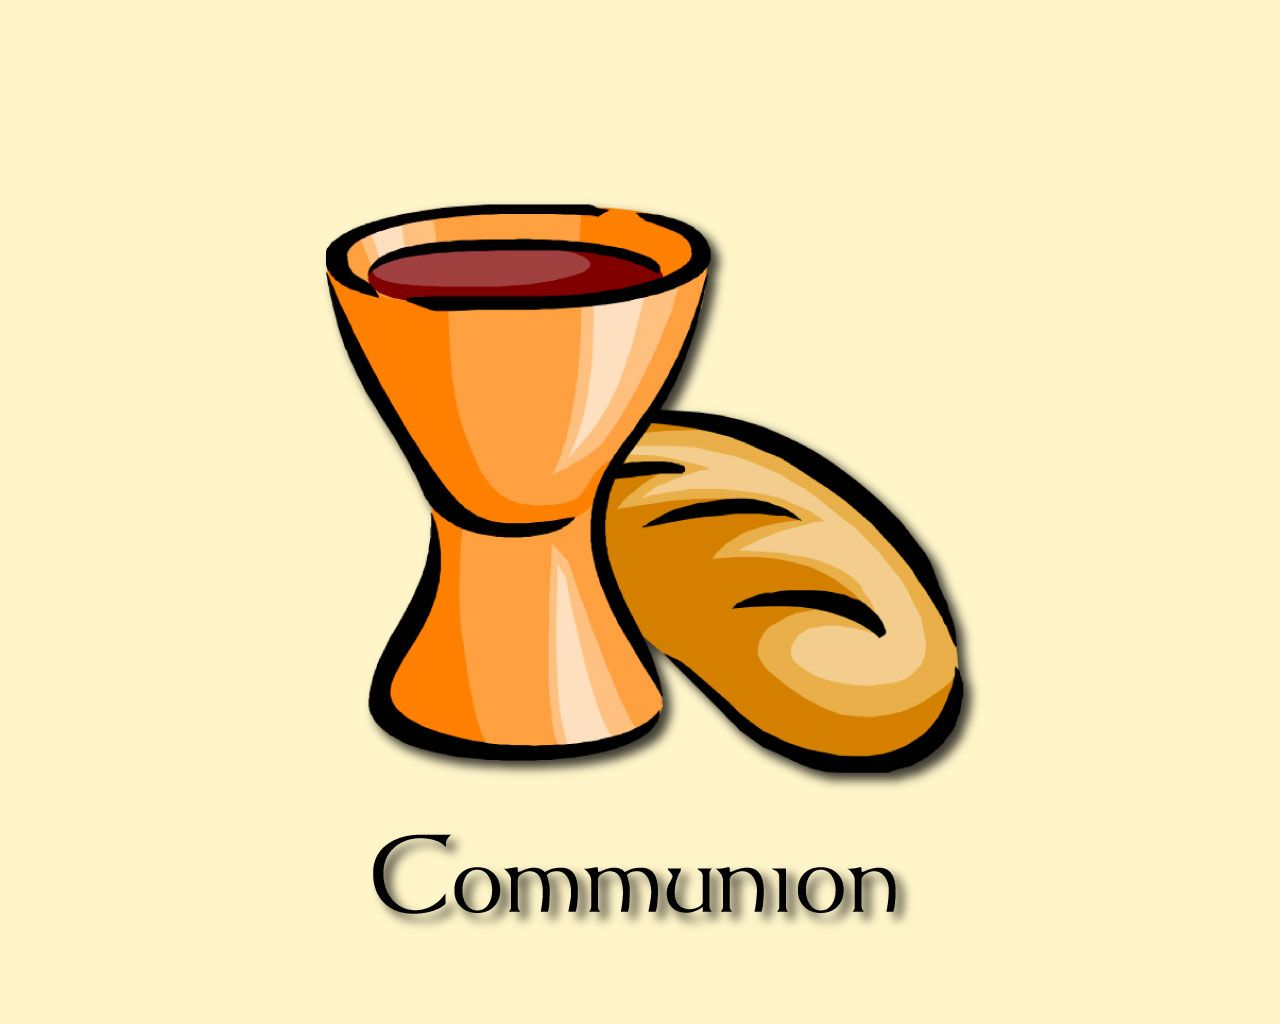 Holy Communion Clip Art Free Clipart.